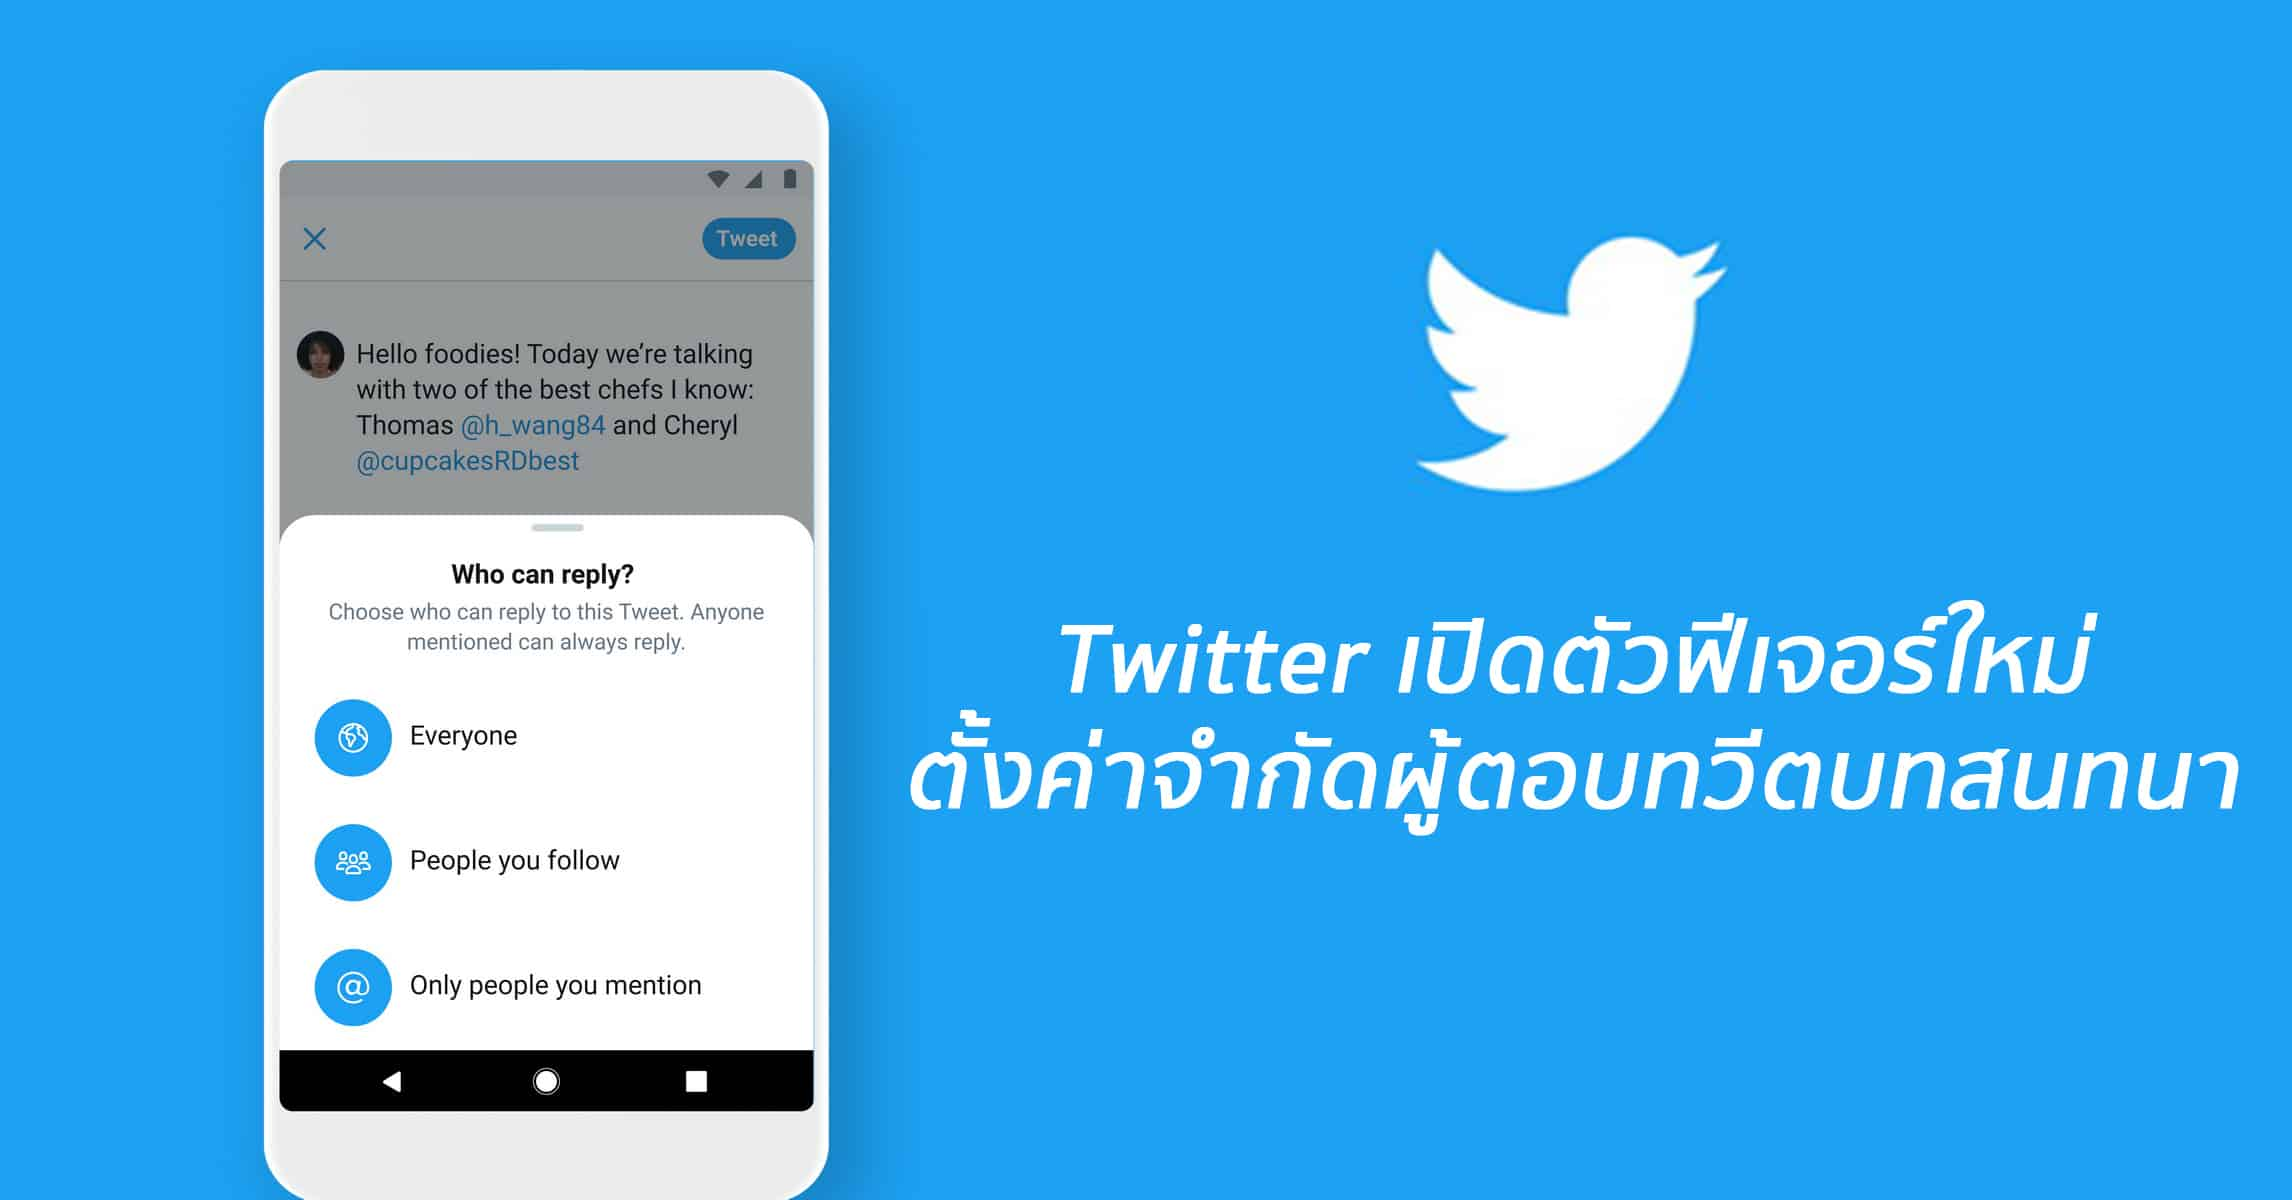 Twitter เปิดตัวฟีเจอร์ใหม่ ตั้งค่าจำกัดผู้ตอบทวีตบทสนทนา